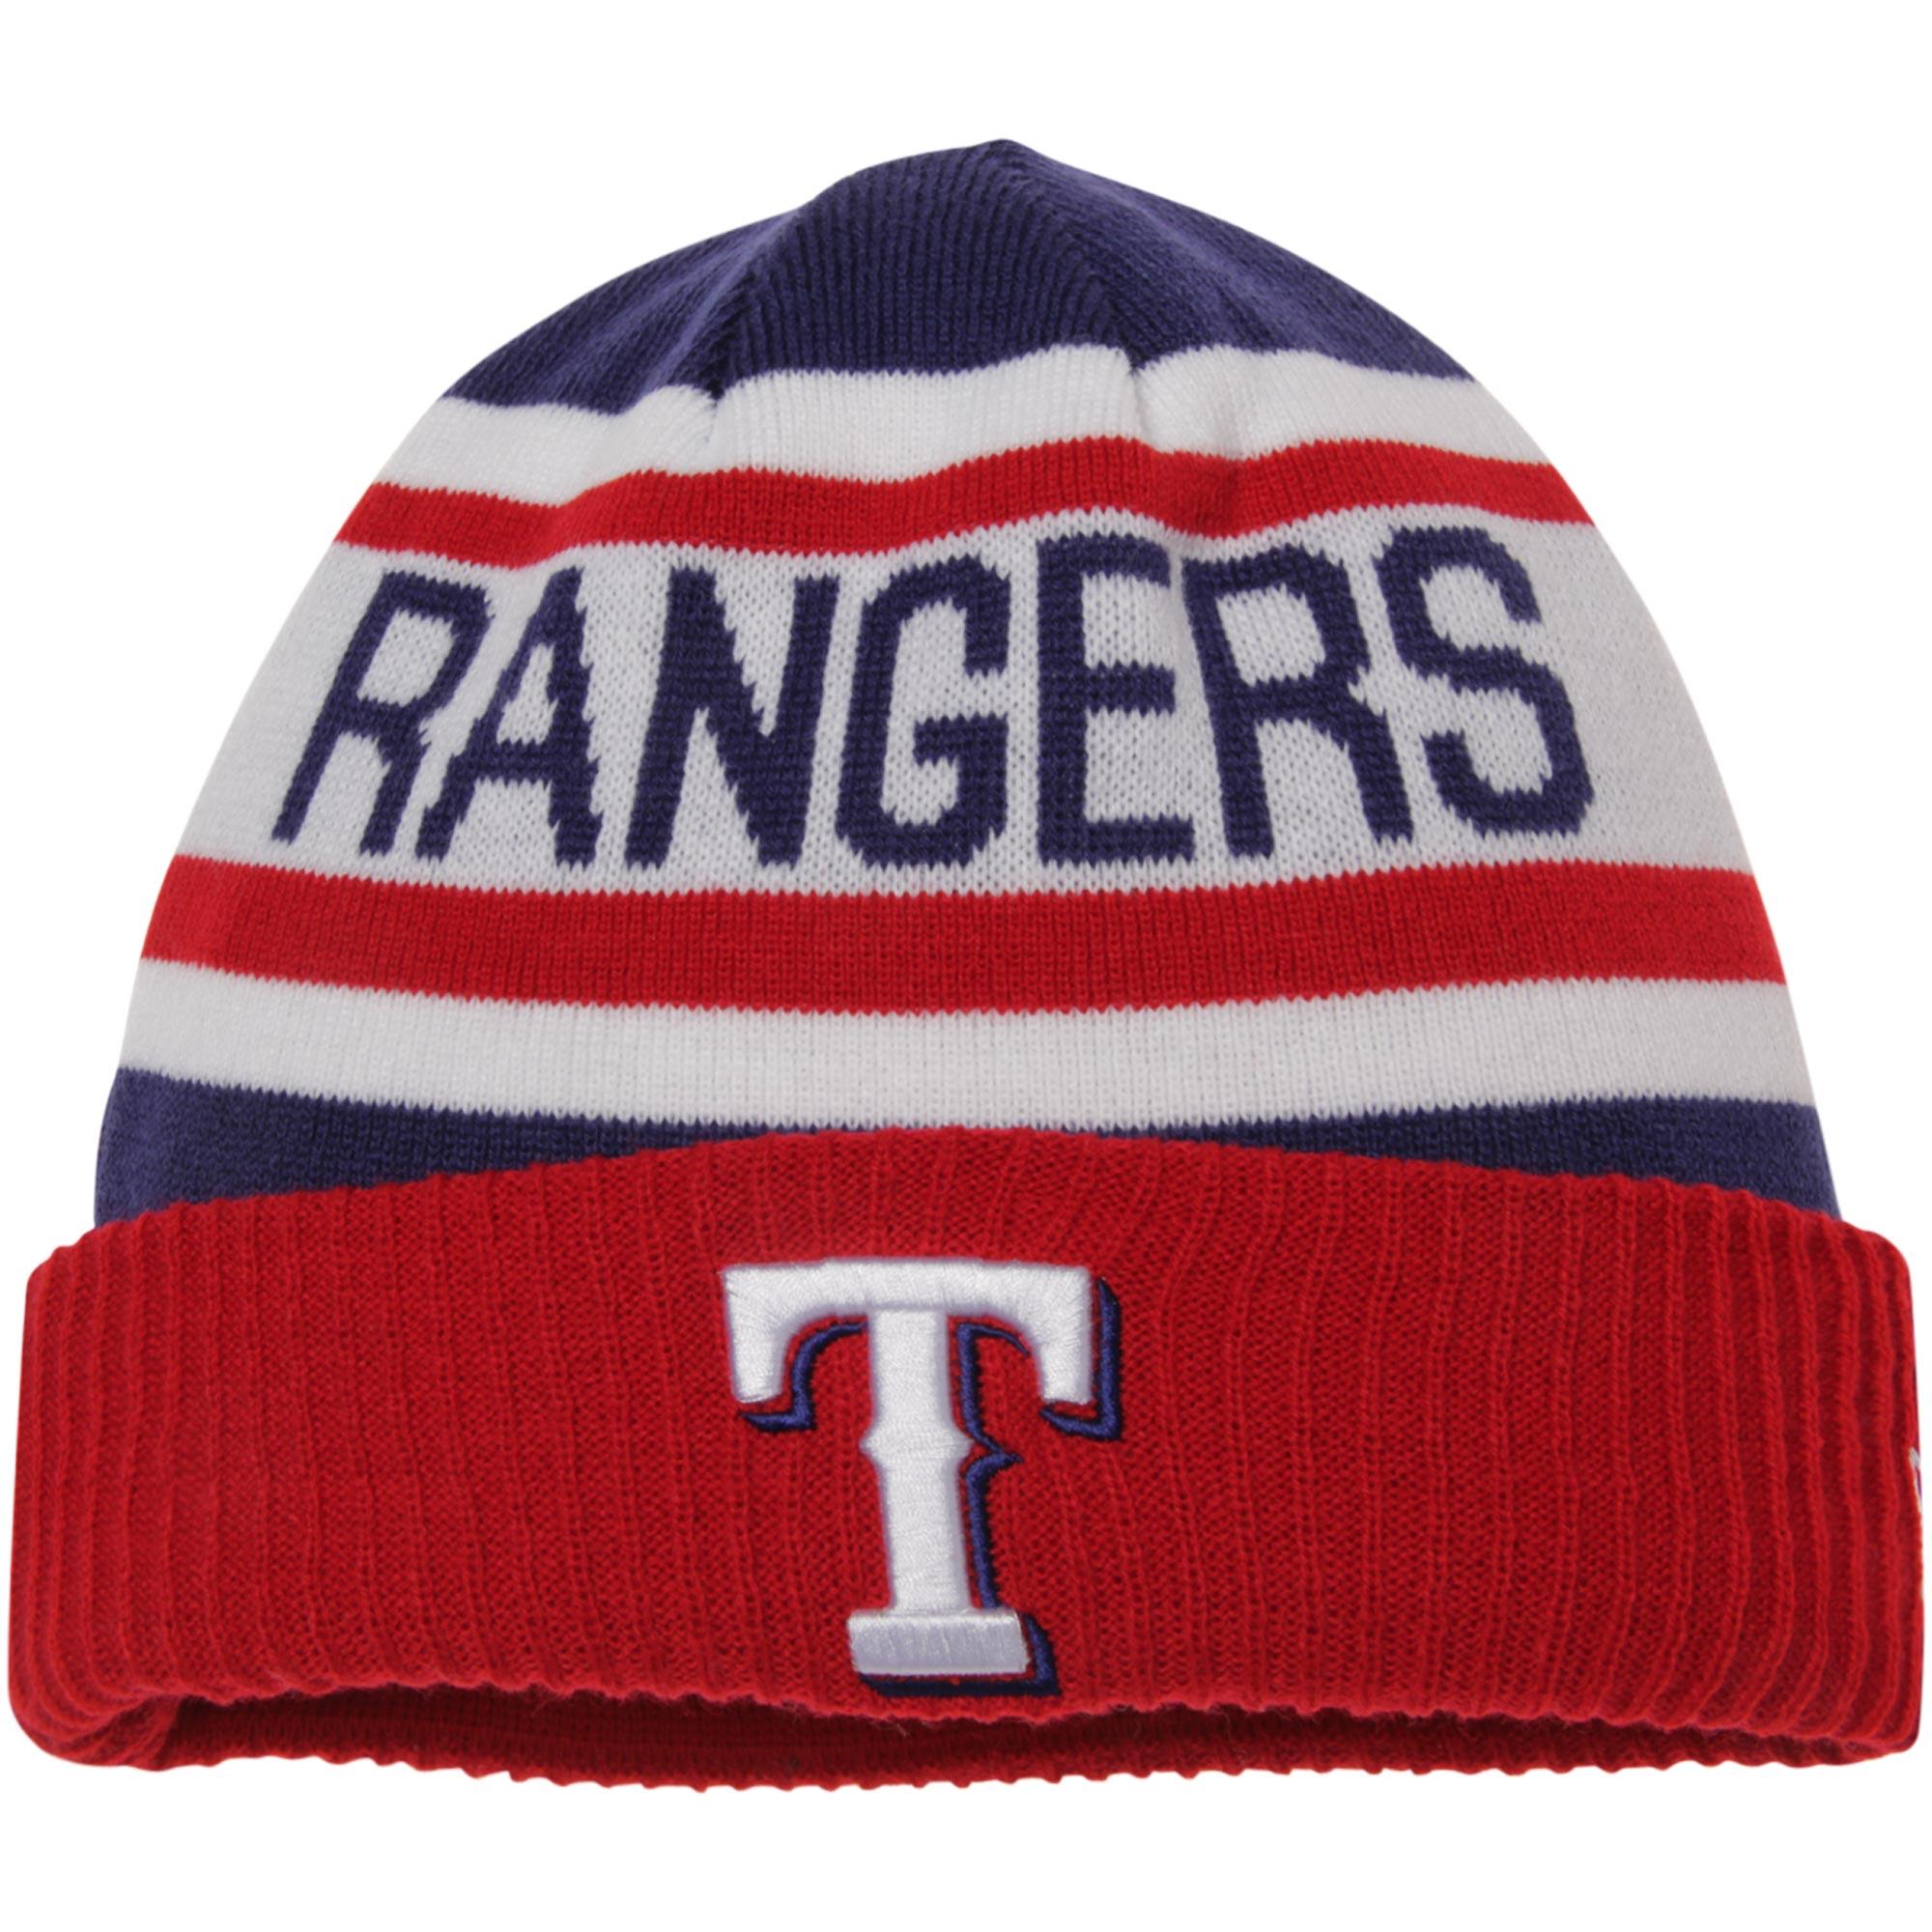 Texas Rangers New Era Biggest Fan 2.0 Cuffed Knit Hat - White/Red - OSFA